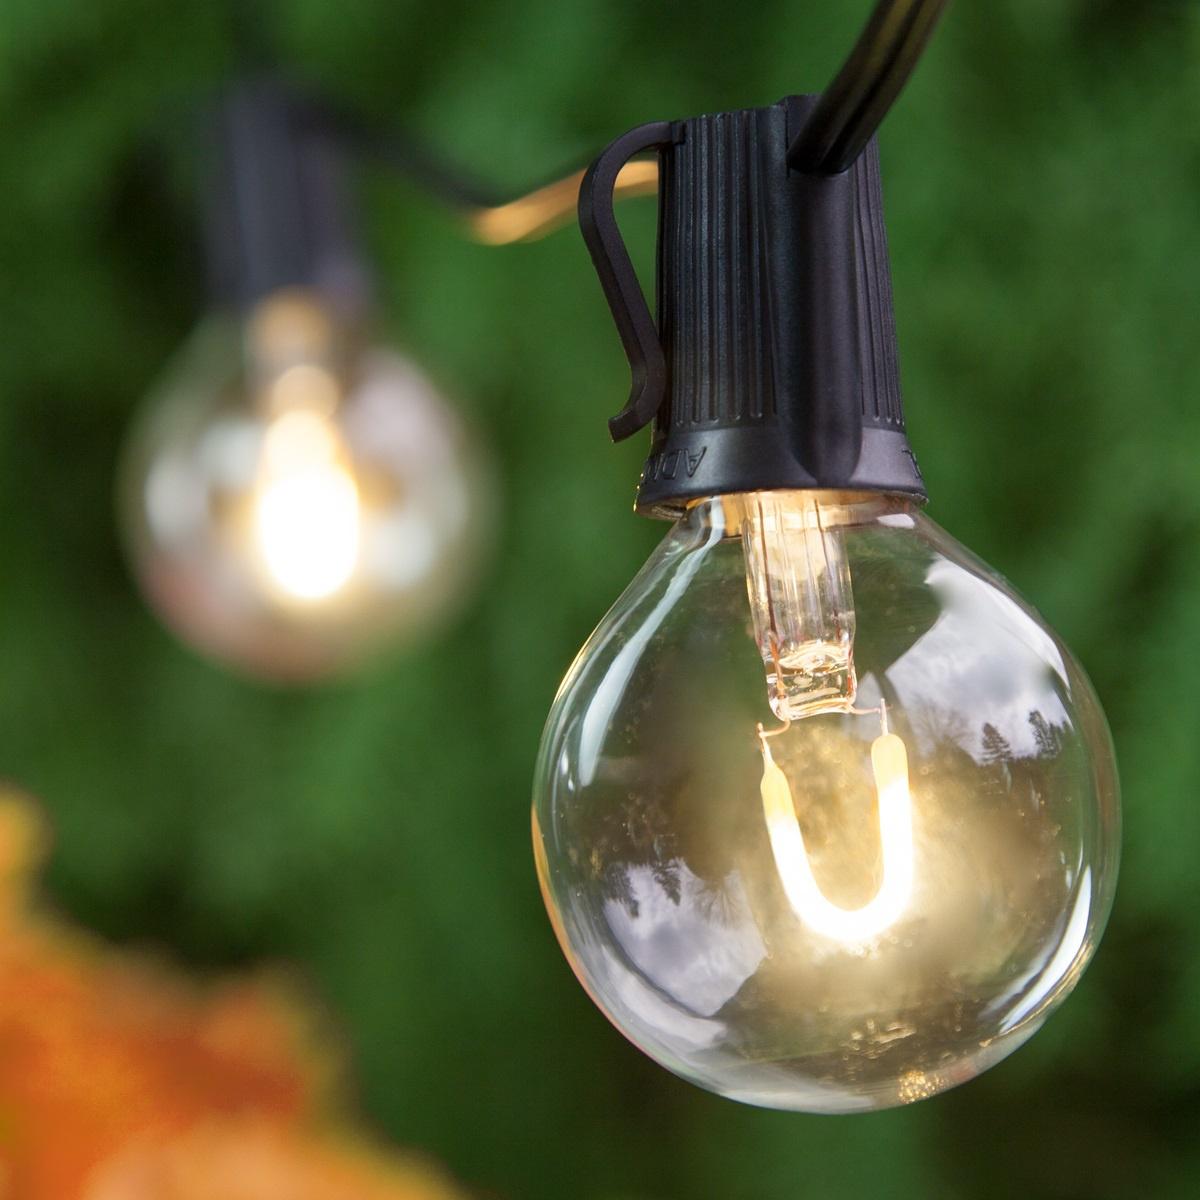 Shatterproof Patio Light Bulbs